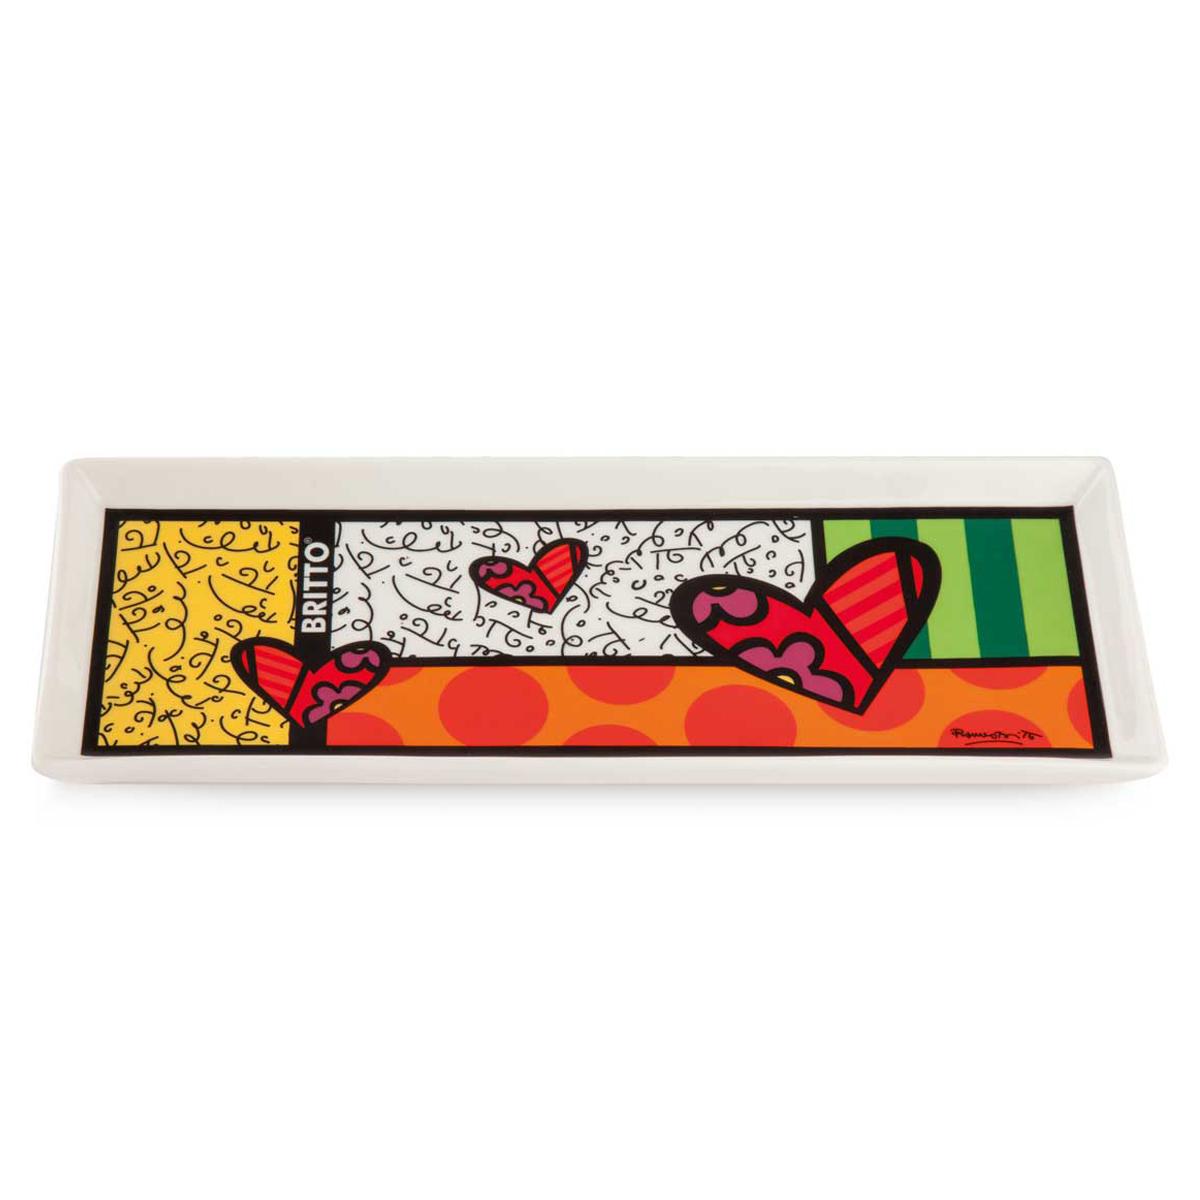 Plateau porcelaine \'Britto\' multicolore (love) - 26x10 cm - [A3291]